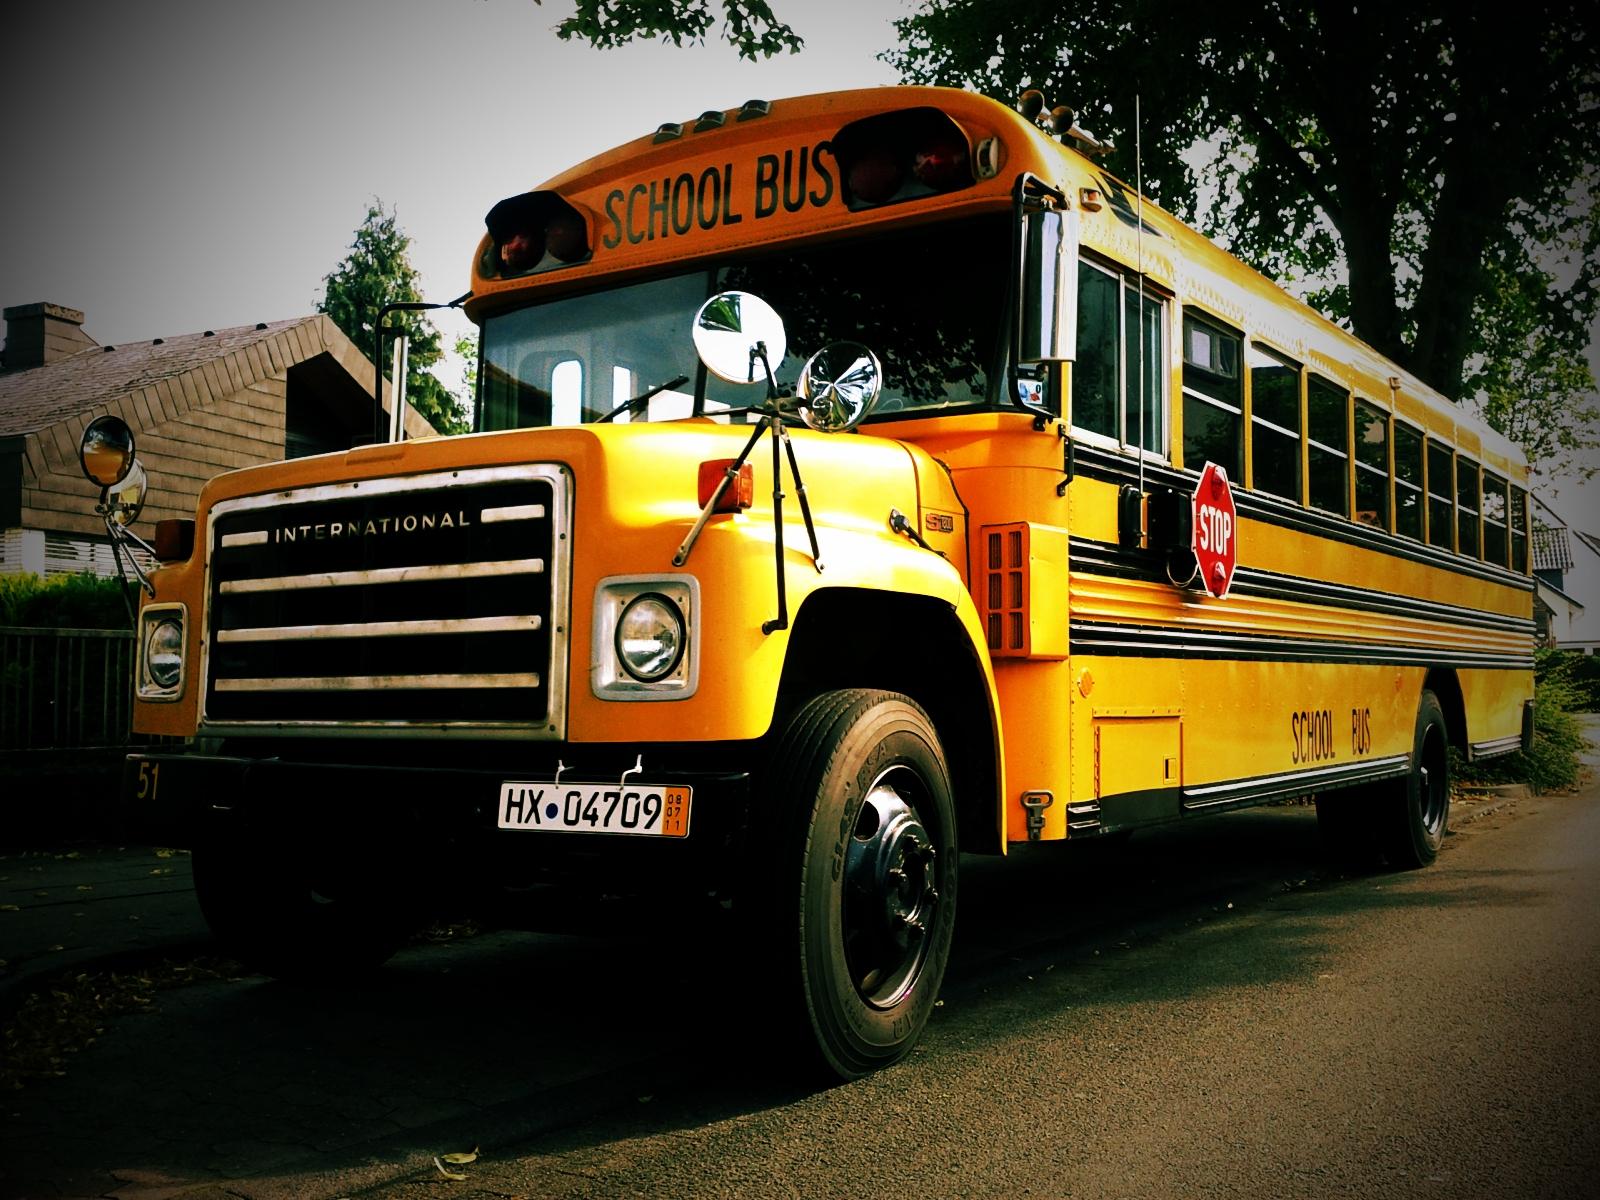 school bus wallpapers hd - photo #31